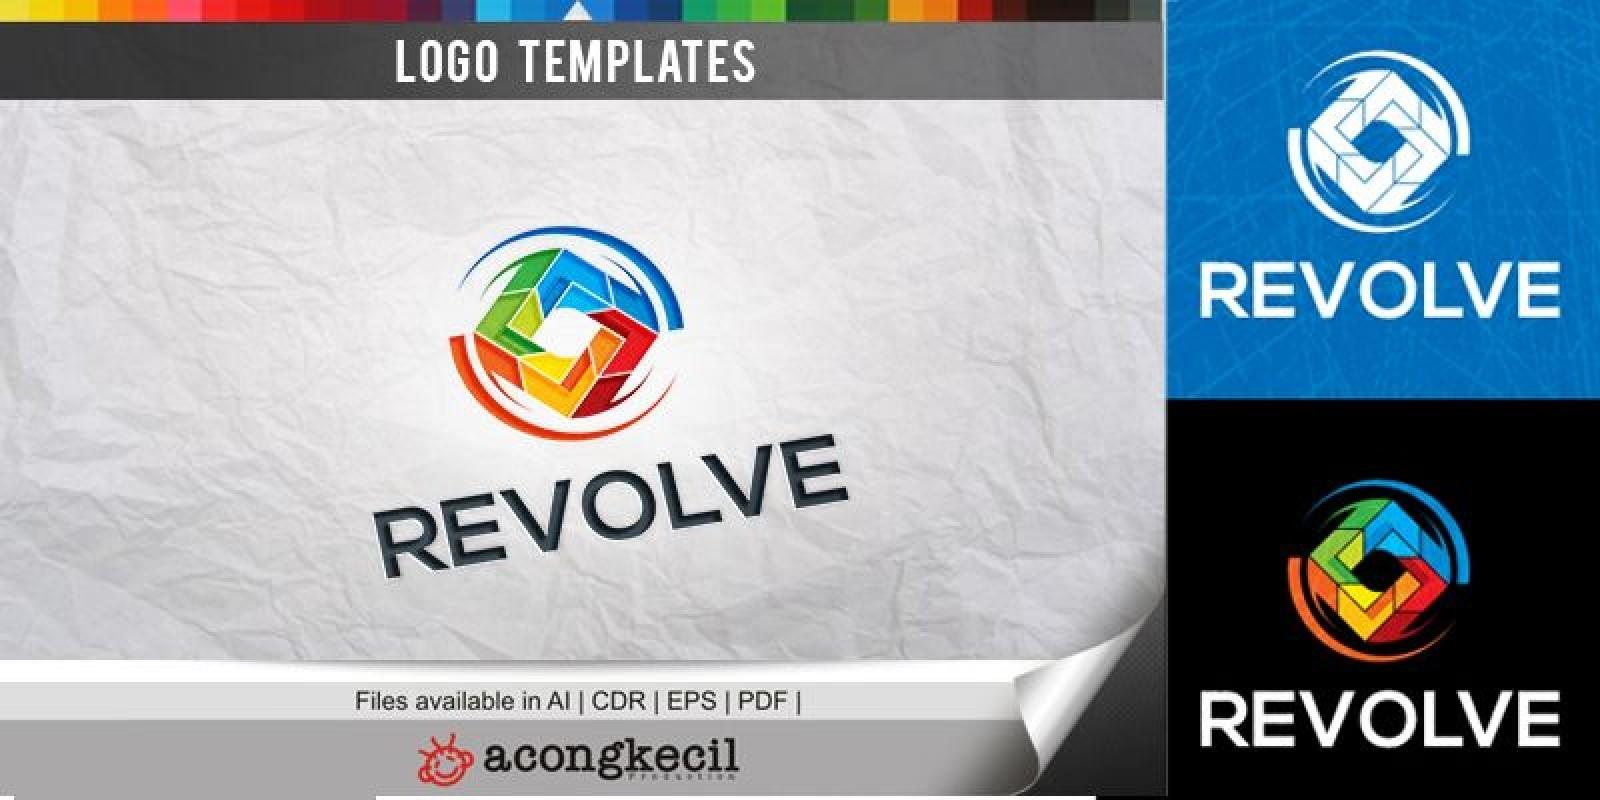 Revolve - Logo Template